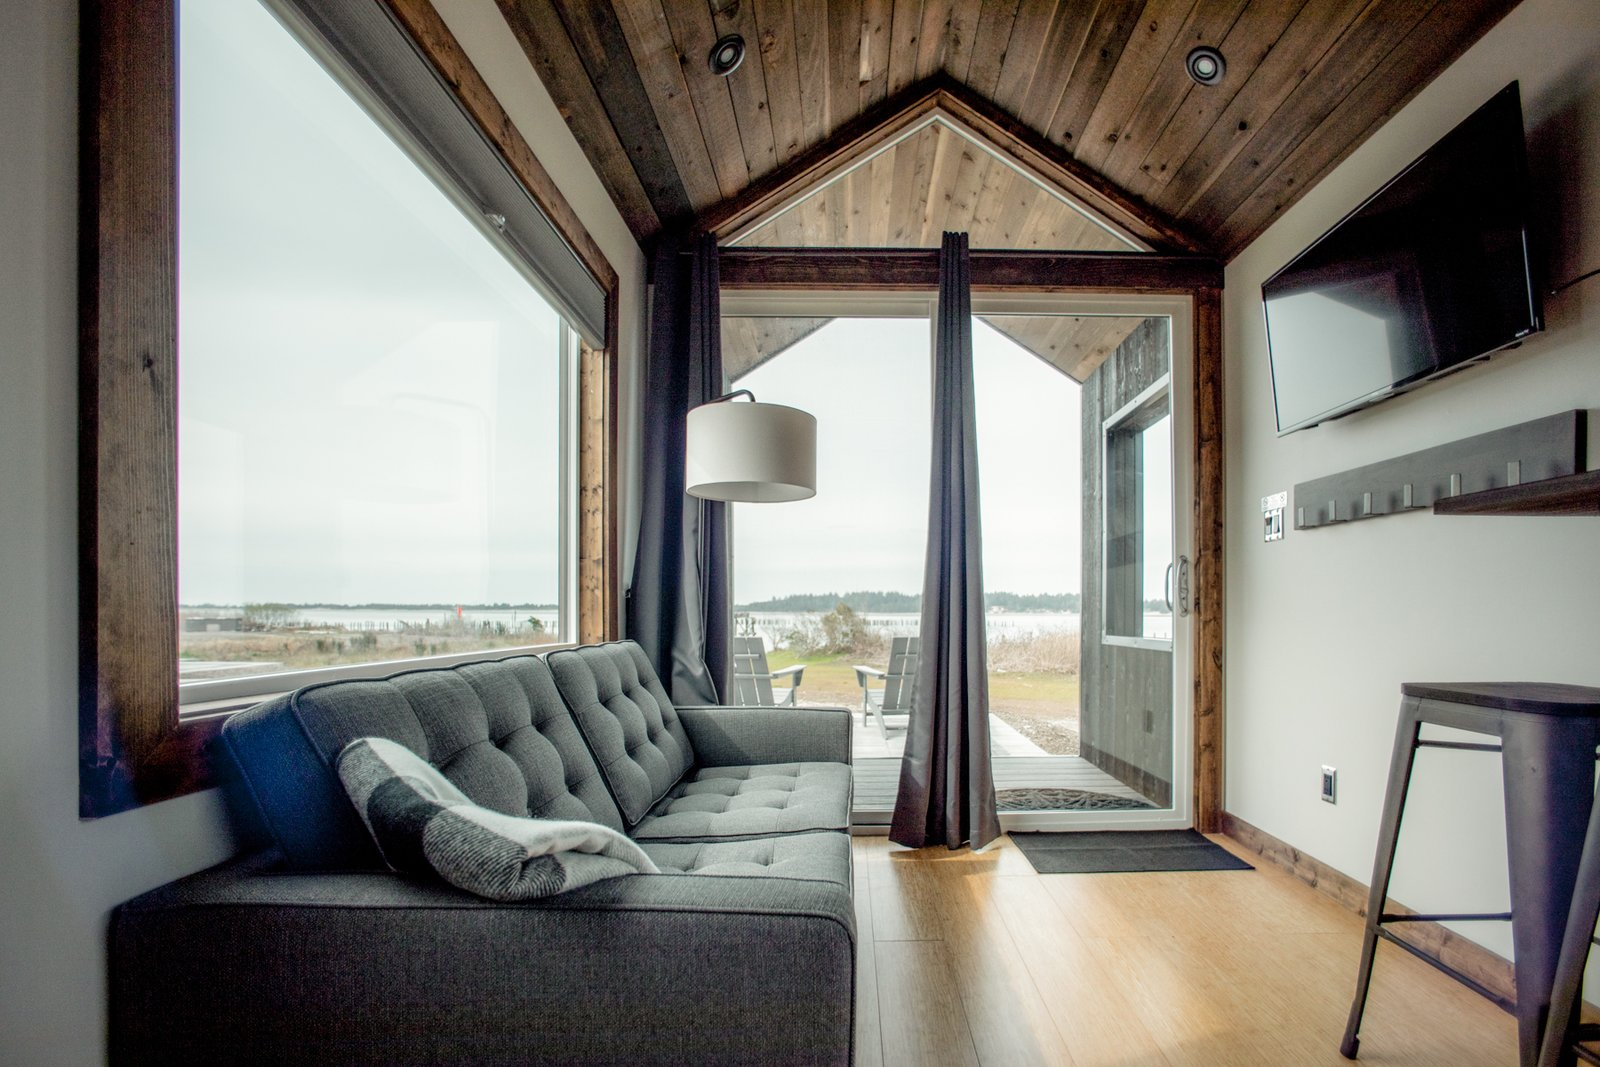 OFFICEUNTITLED JHL Design Bay Point Landing modern cabin